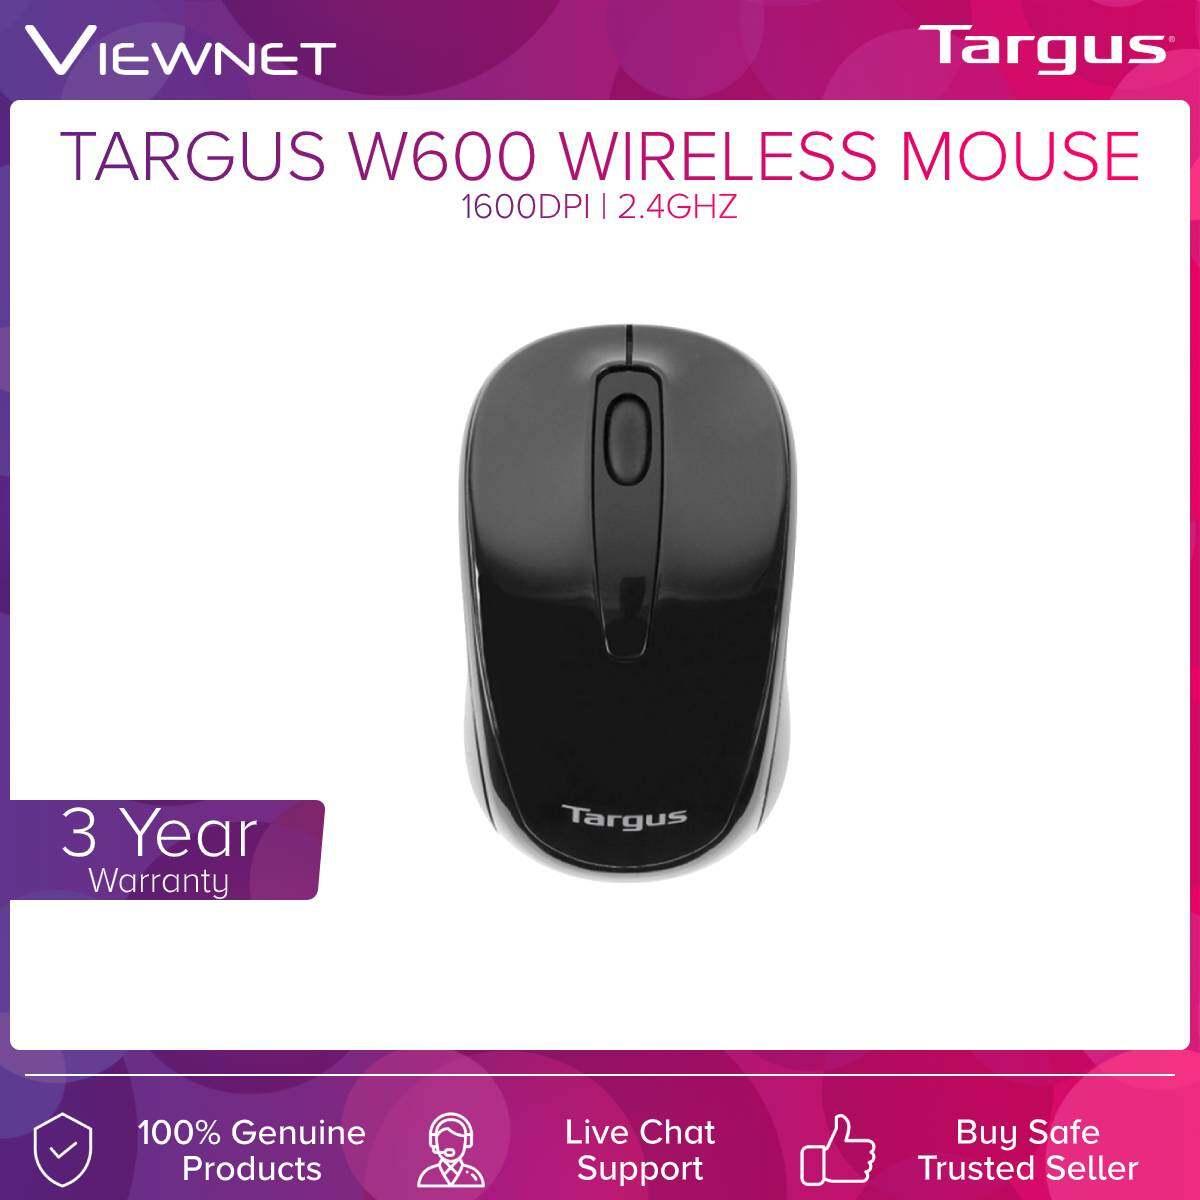 TARGUS WIRELESS OPTICAL MOUSE W600  1600DPI 2.4GHZ WITH USB RECEIVER